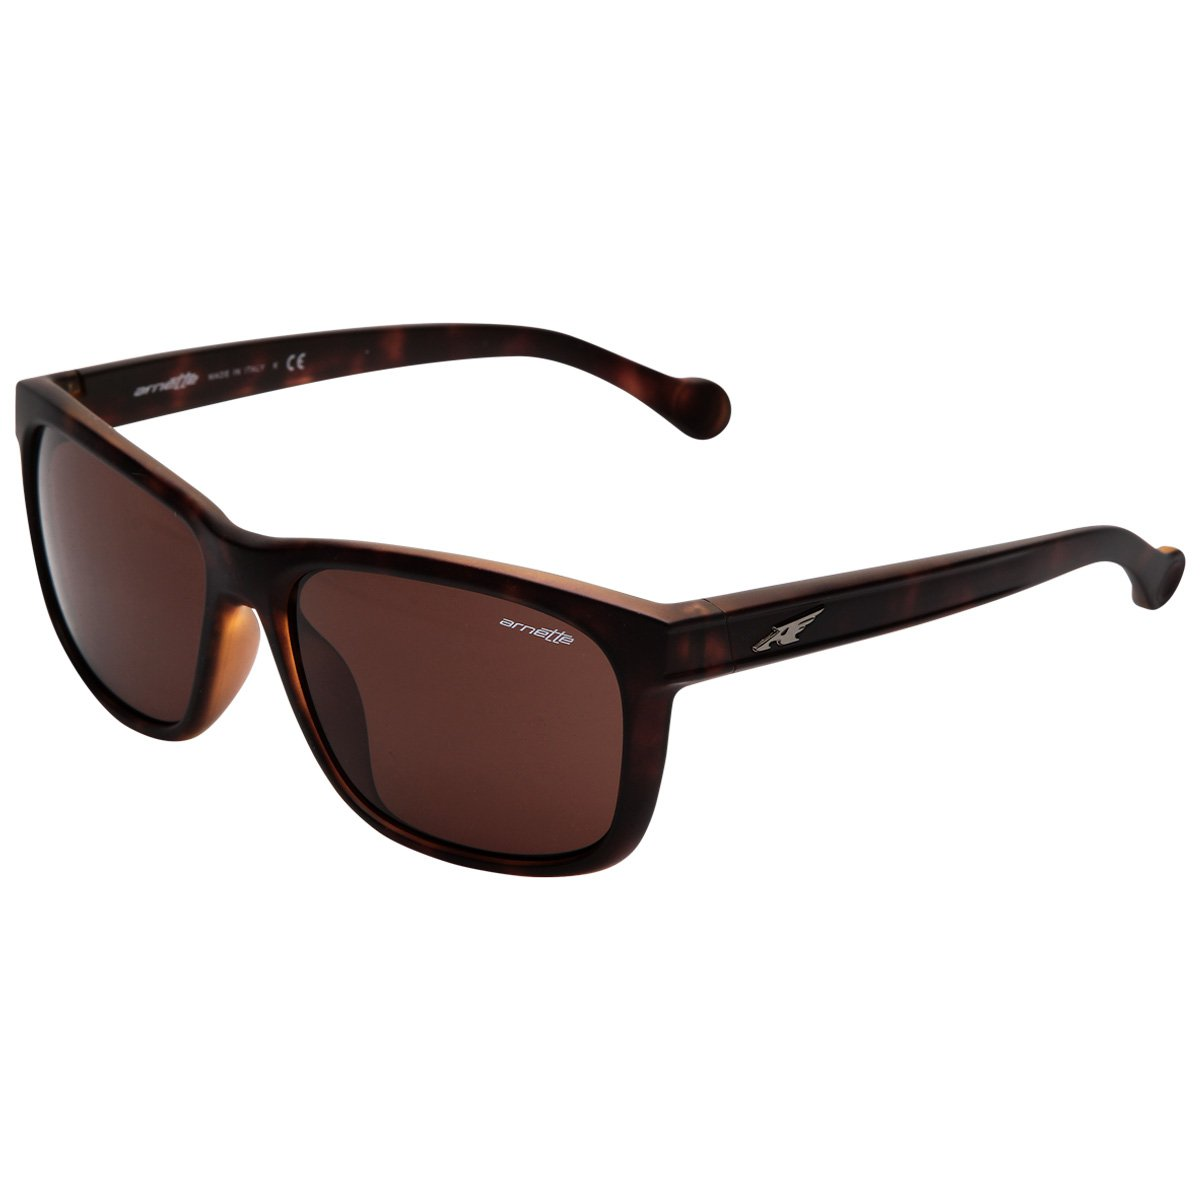 0daee8c3b48b6 Óculos Arnette Fuzzy - Compre Agora